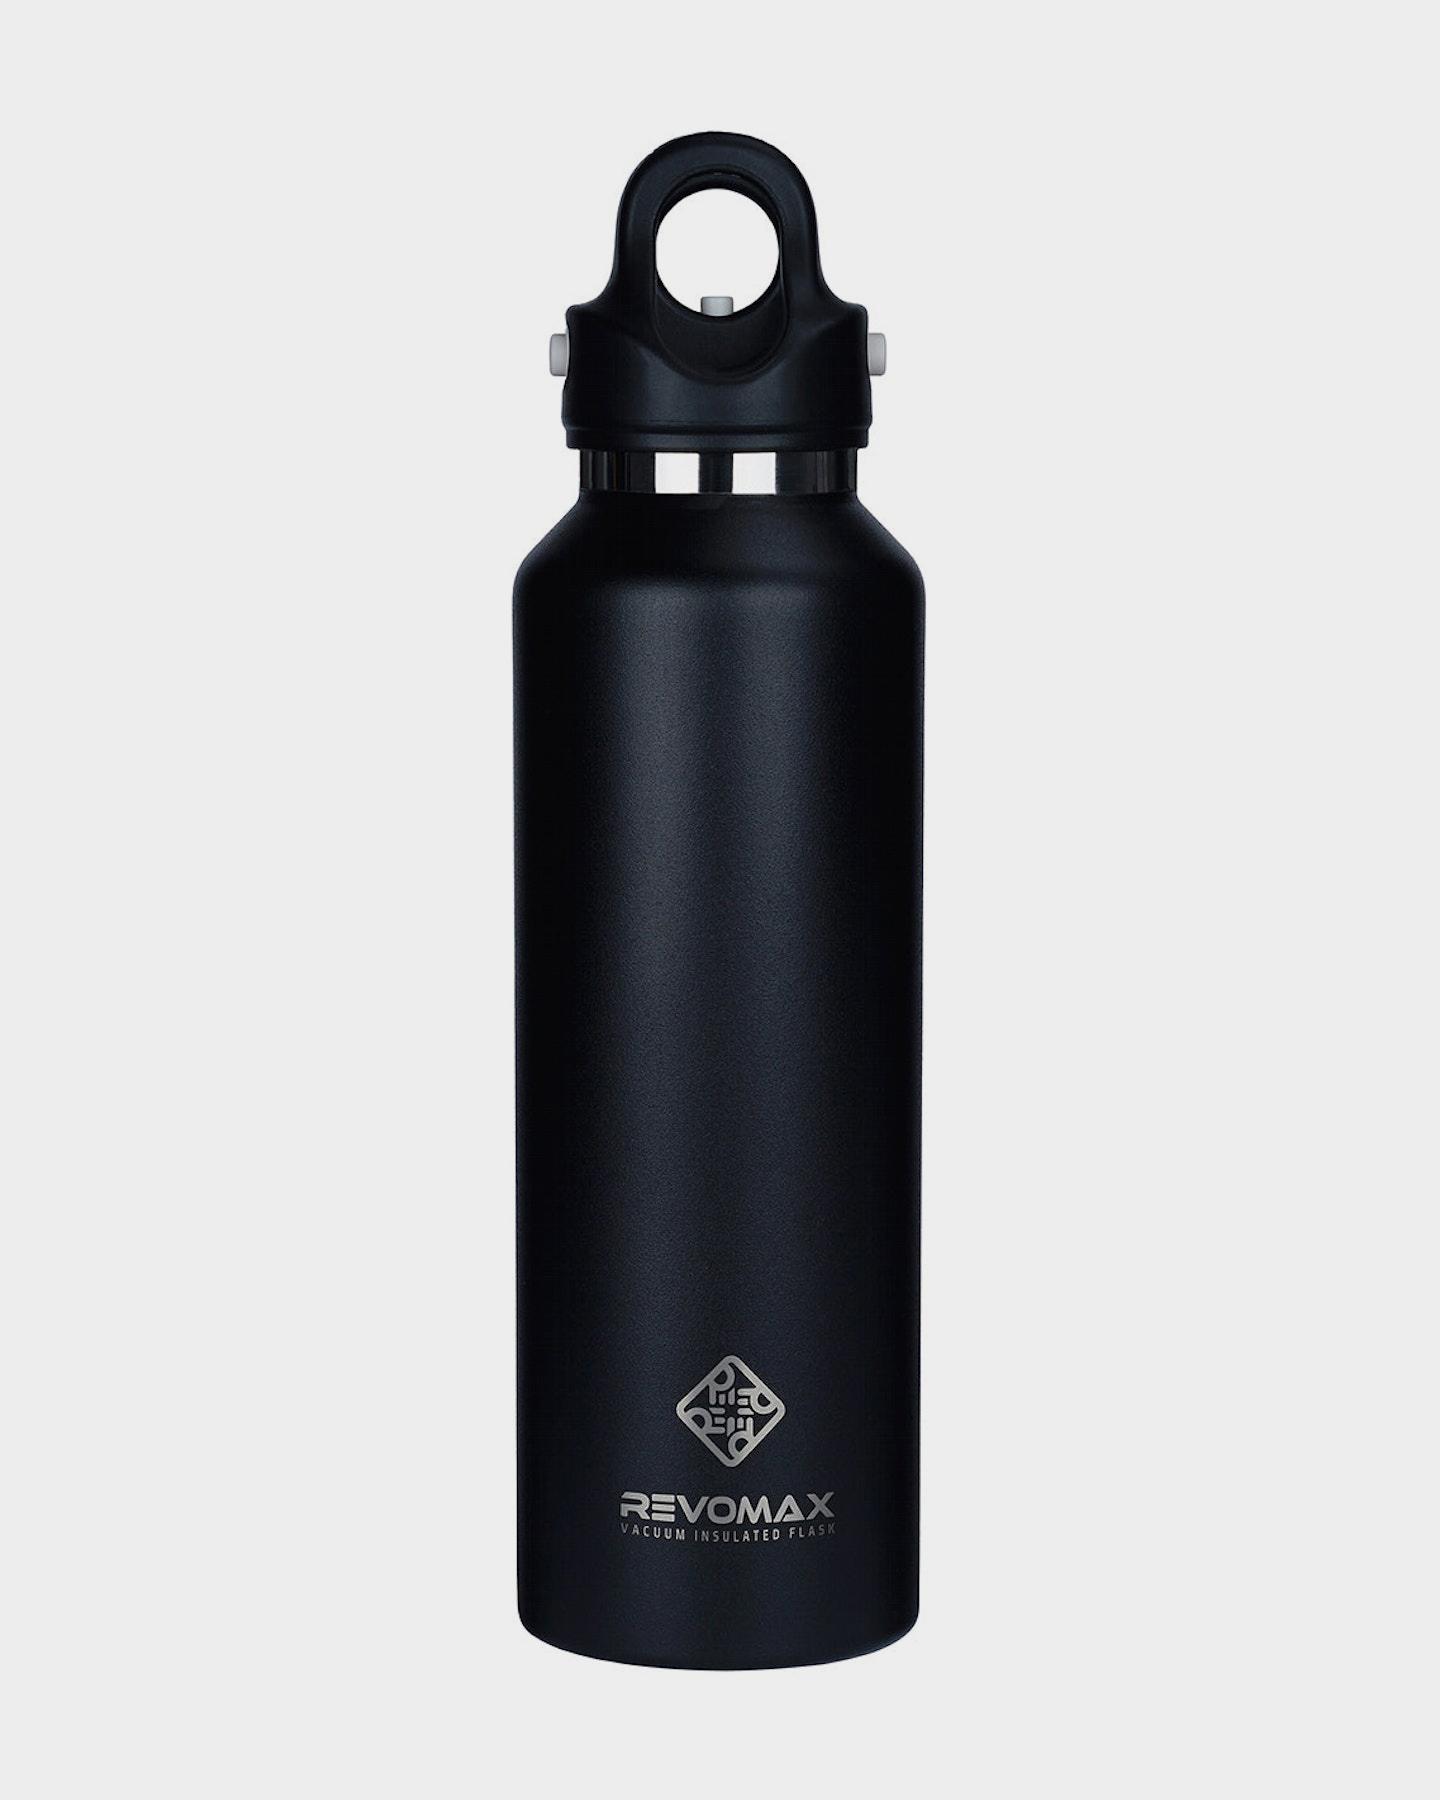 Revomax 592Ml - 20Oz Insulated Flask Drink Bottle Onyx Black